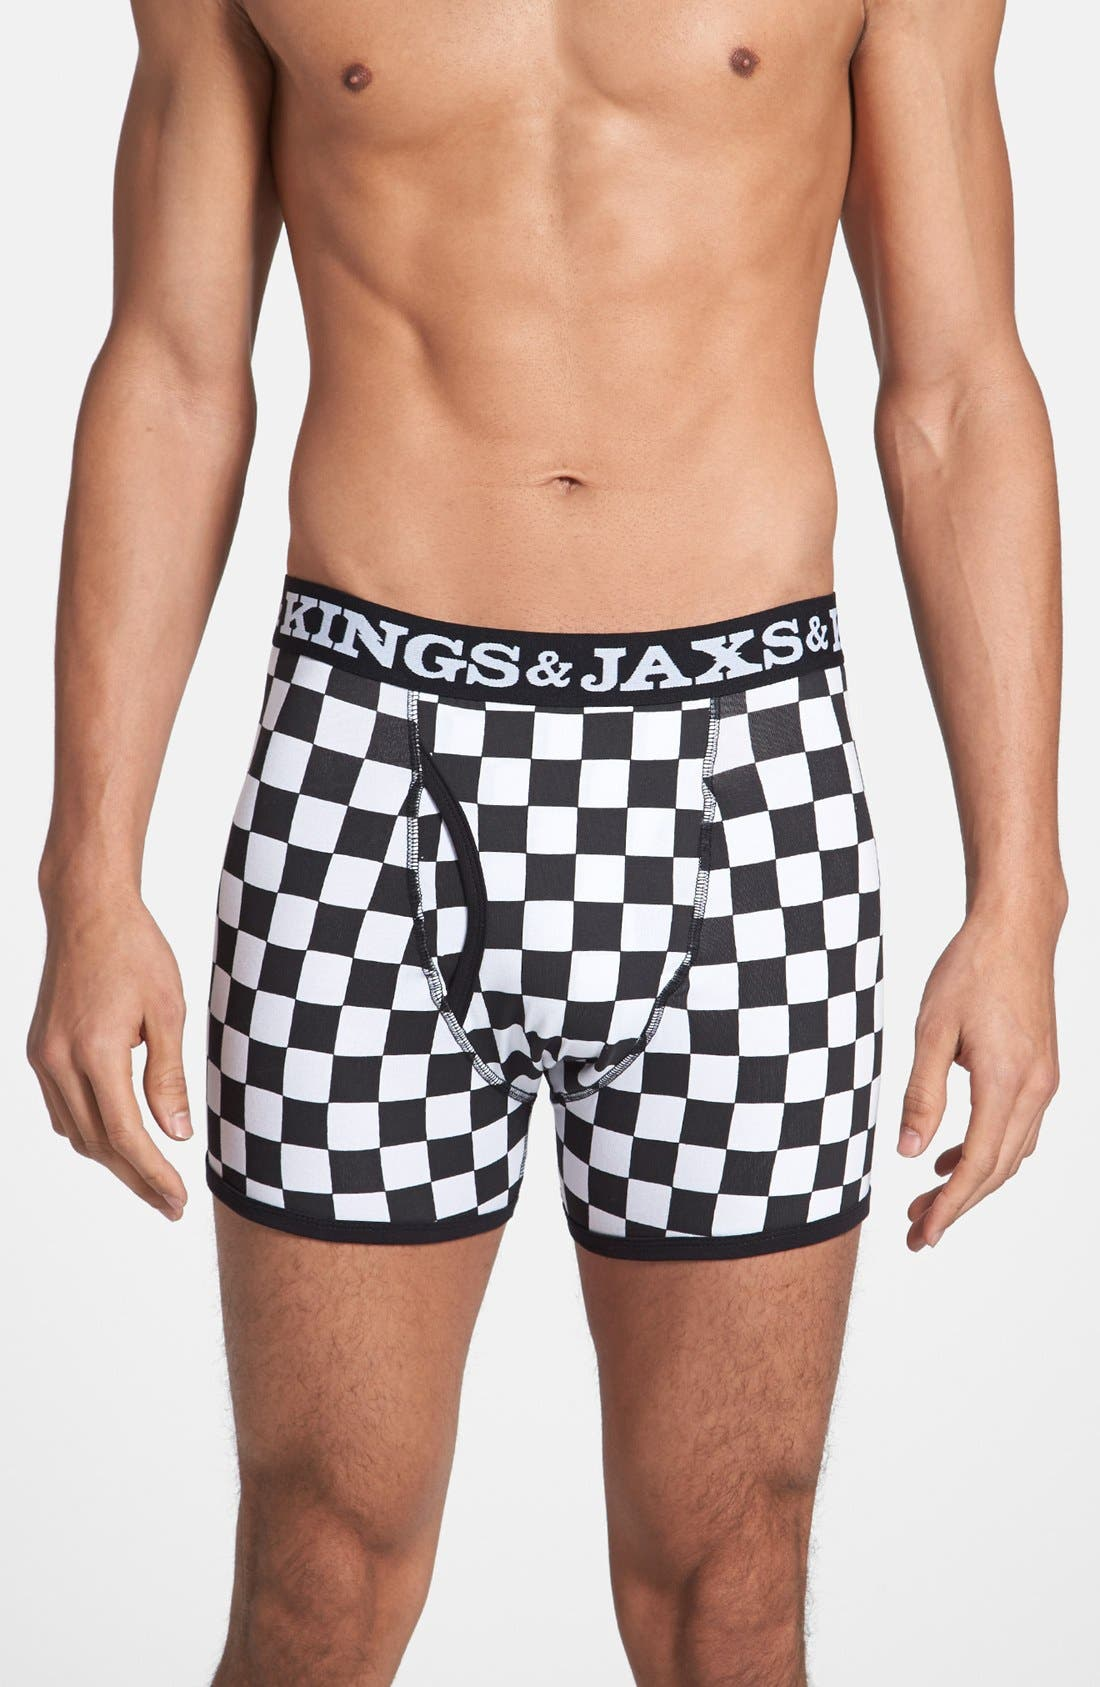 Main Image - KINGS & JAXS Checked Boxer Briefs